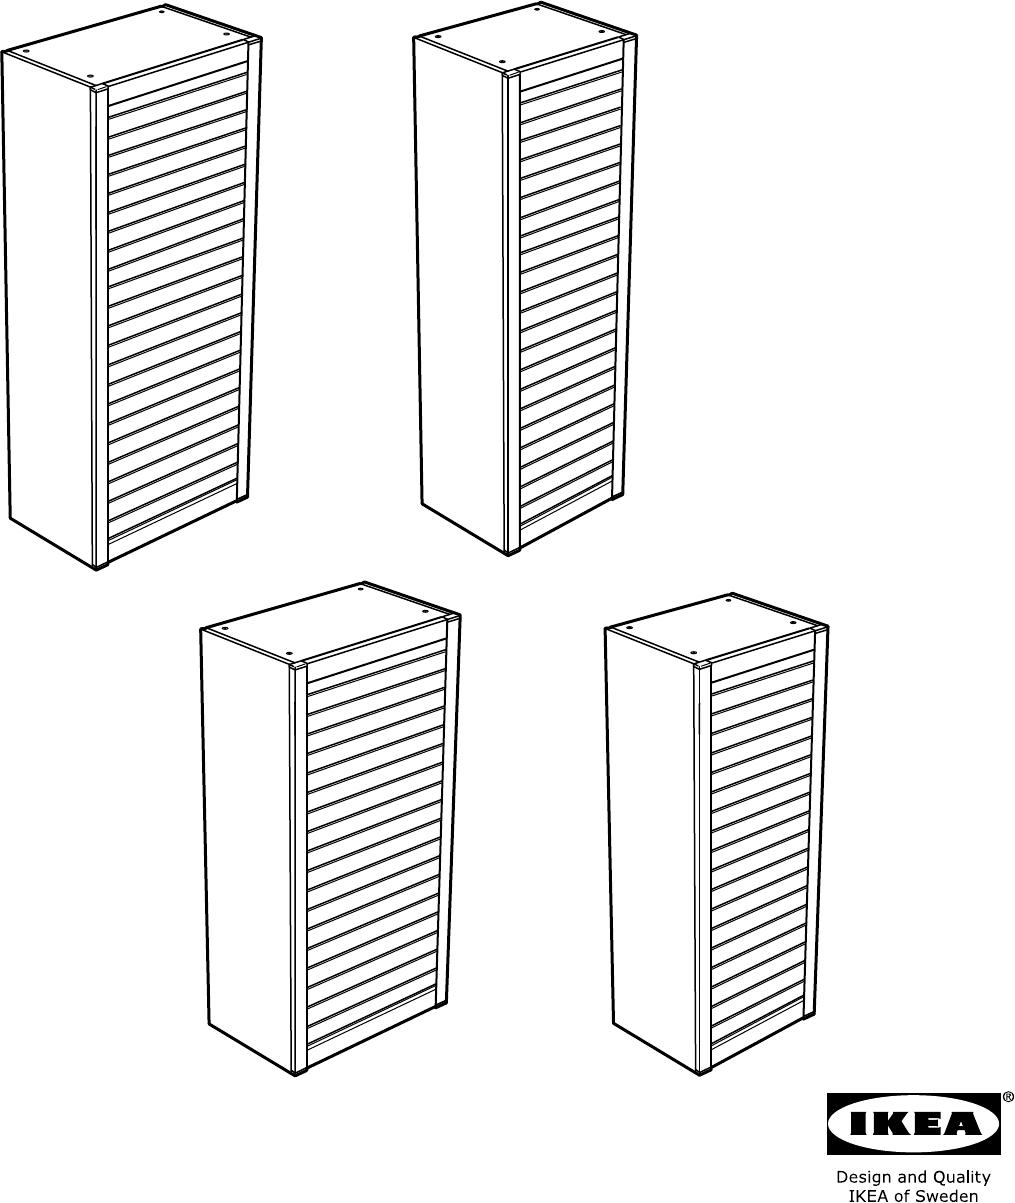 Jalousieschrank ikea  Bedienungsanleitung Ikea AVSIKT Rolluikkast (Seite 1 von 36 ...